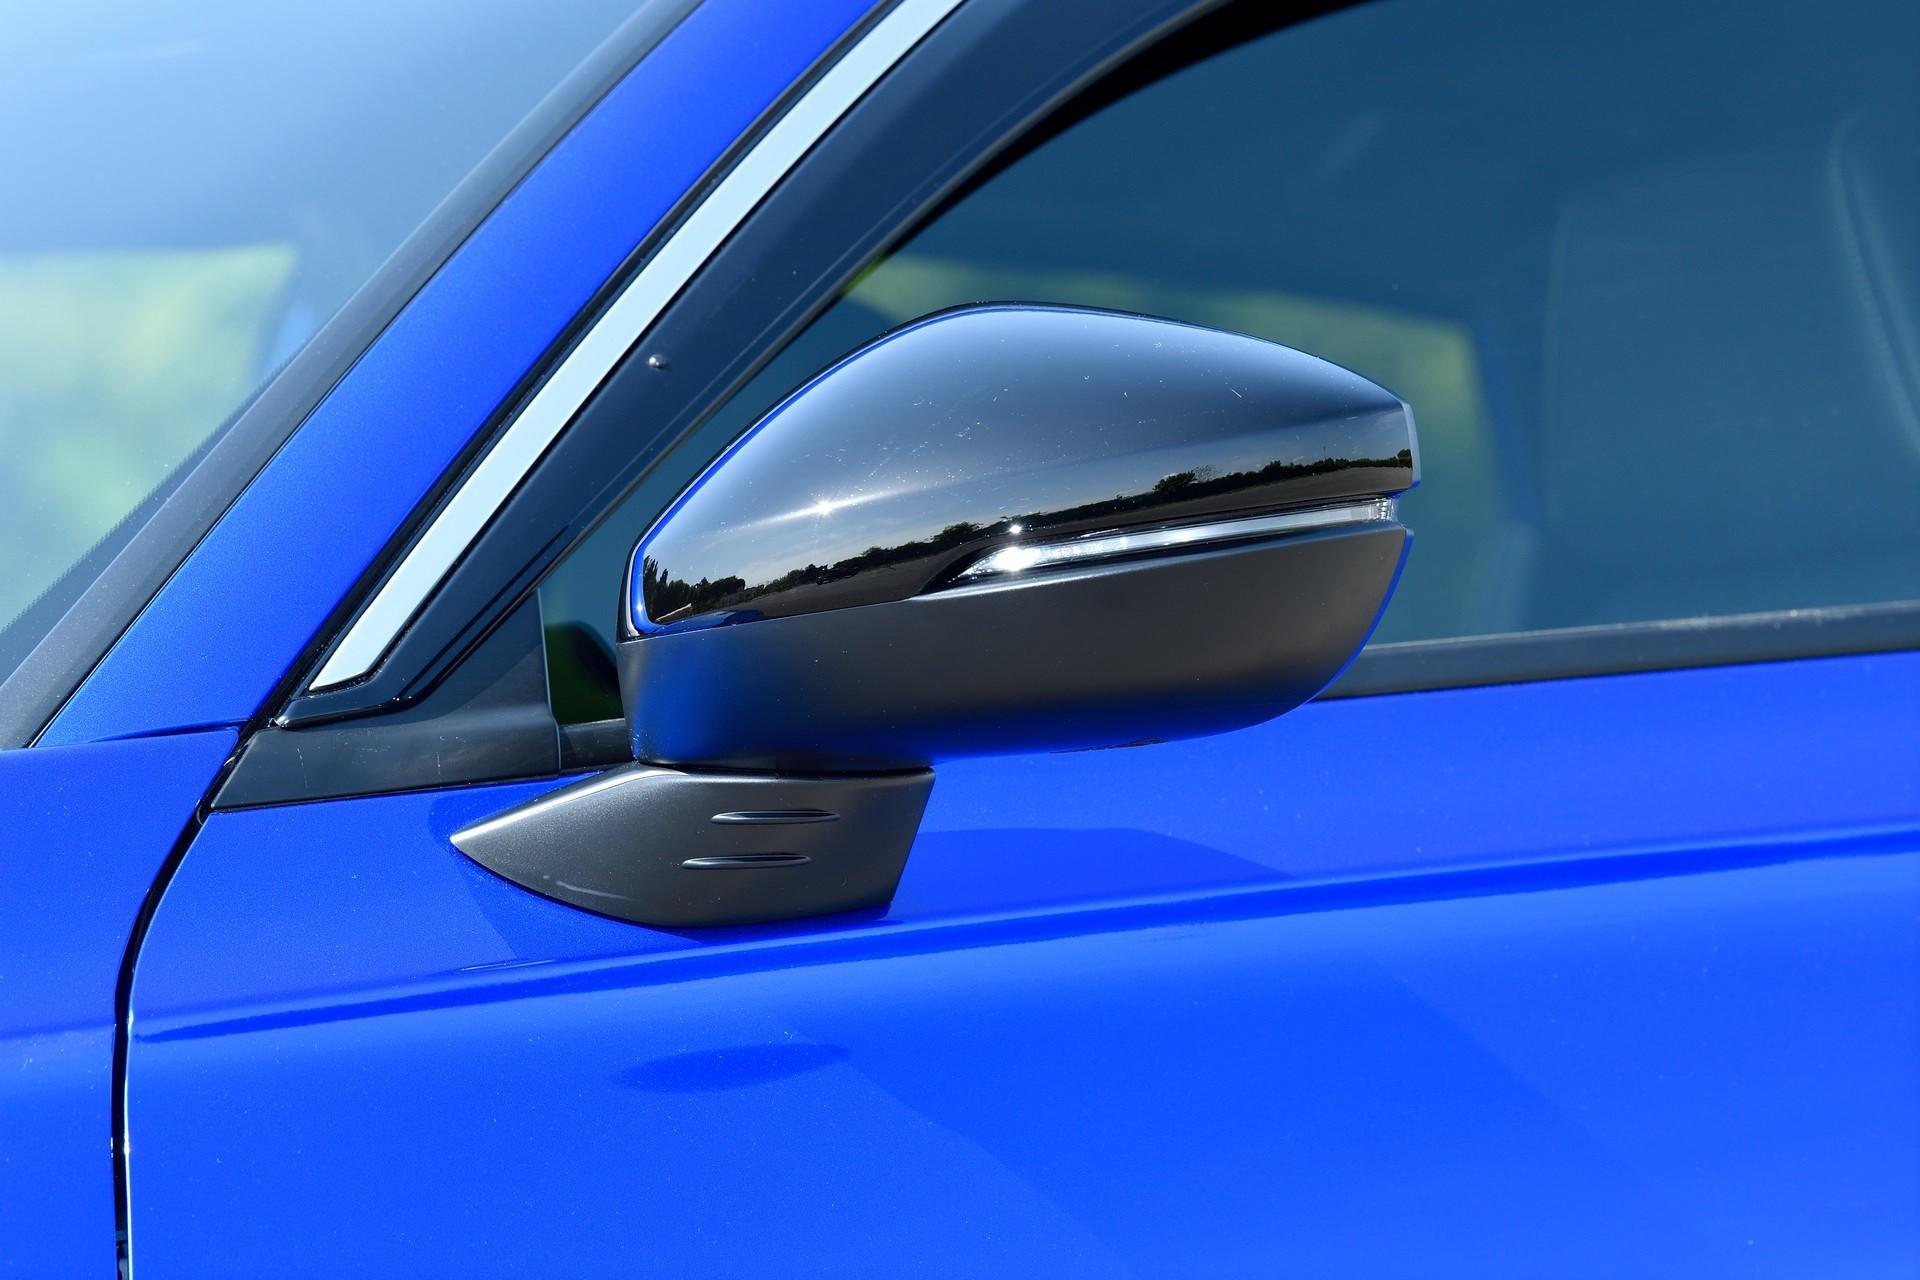 2022-Honda-Civic-Hatch-Accessories-8